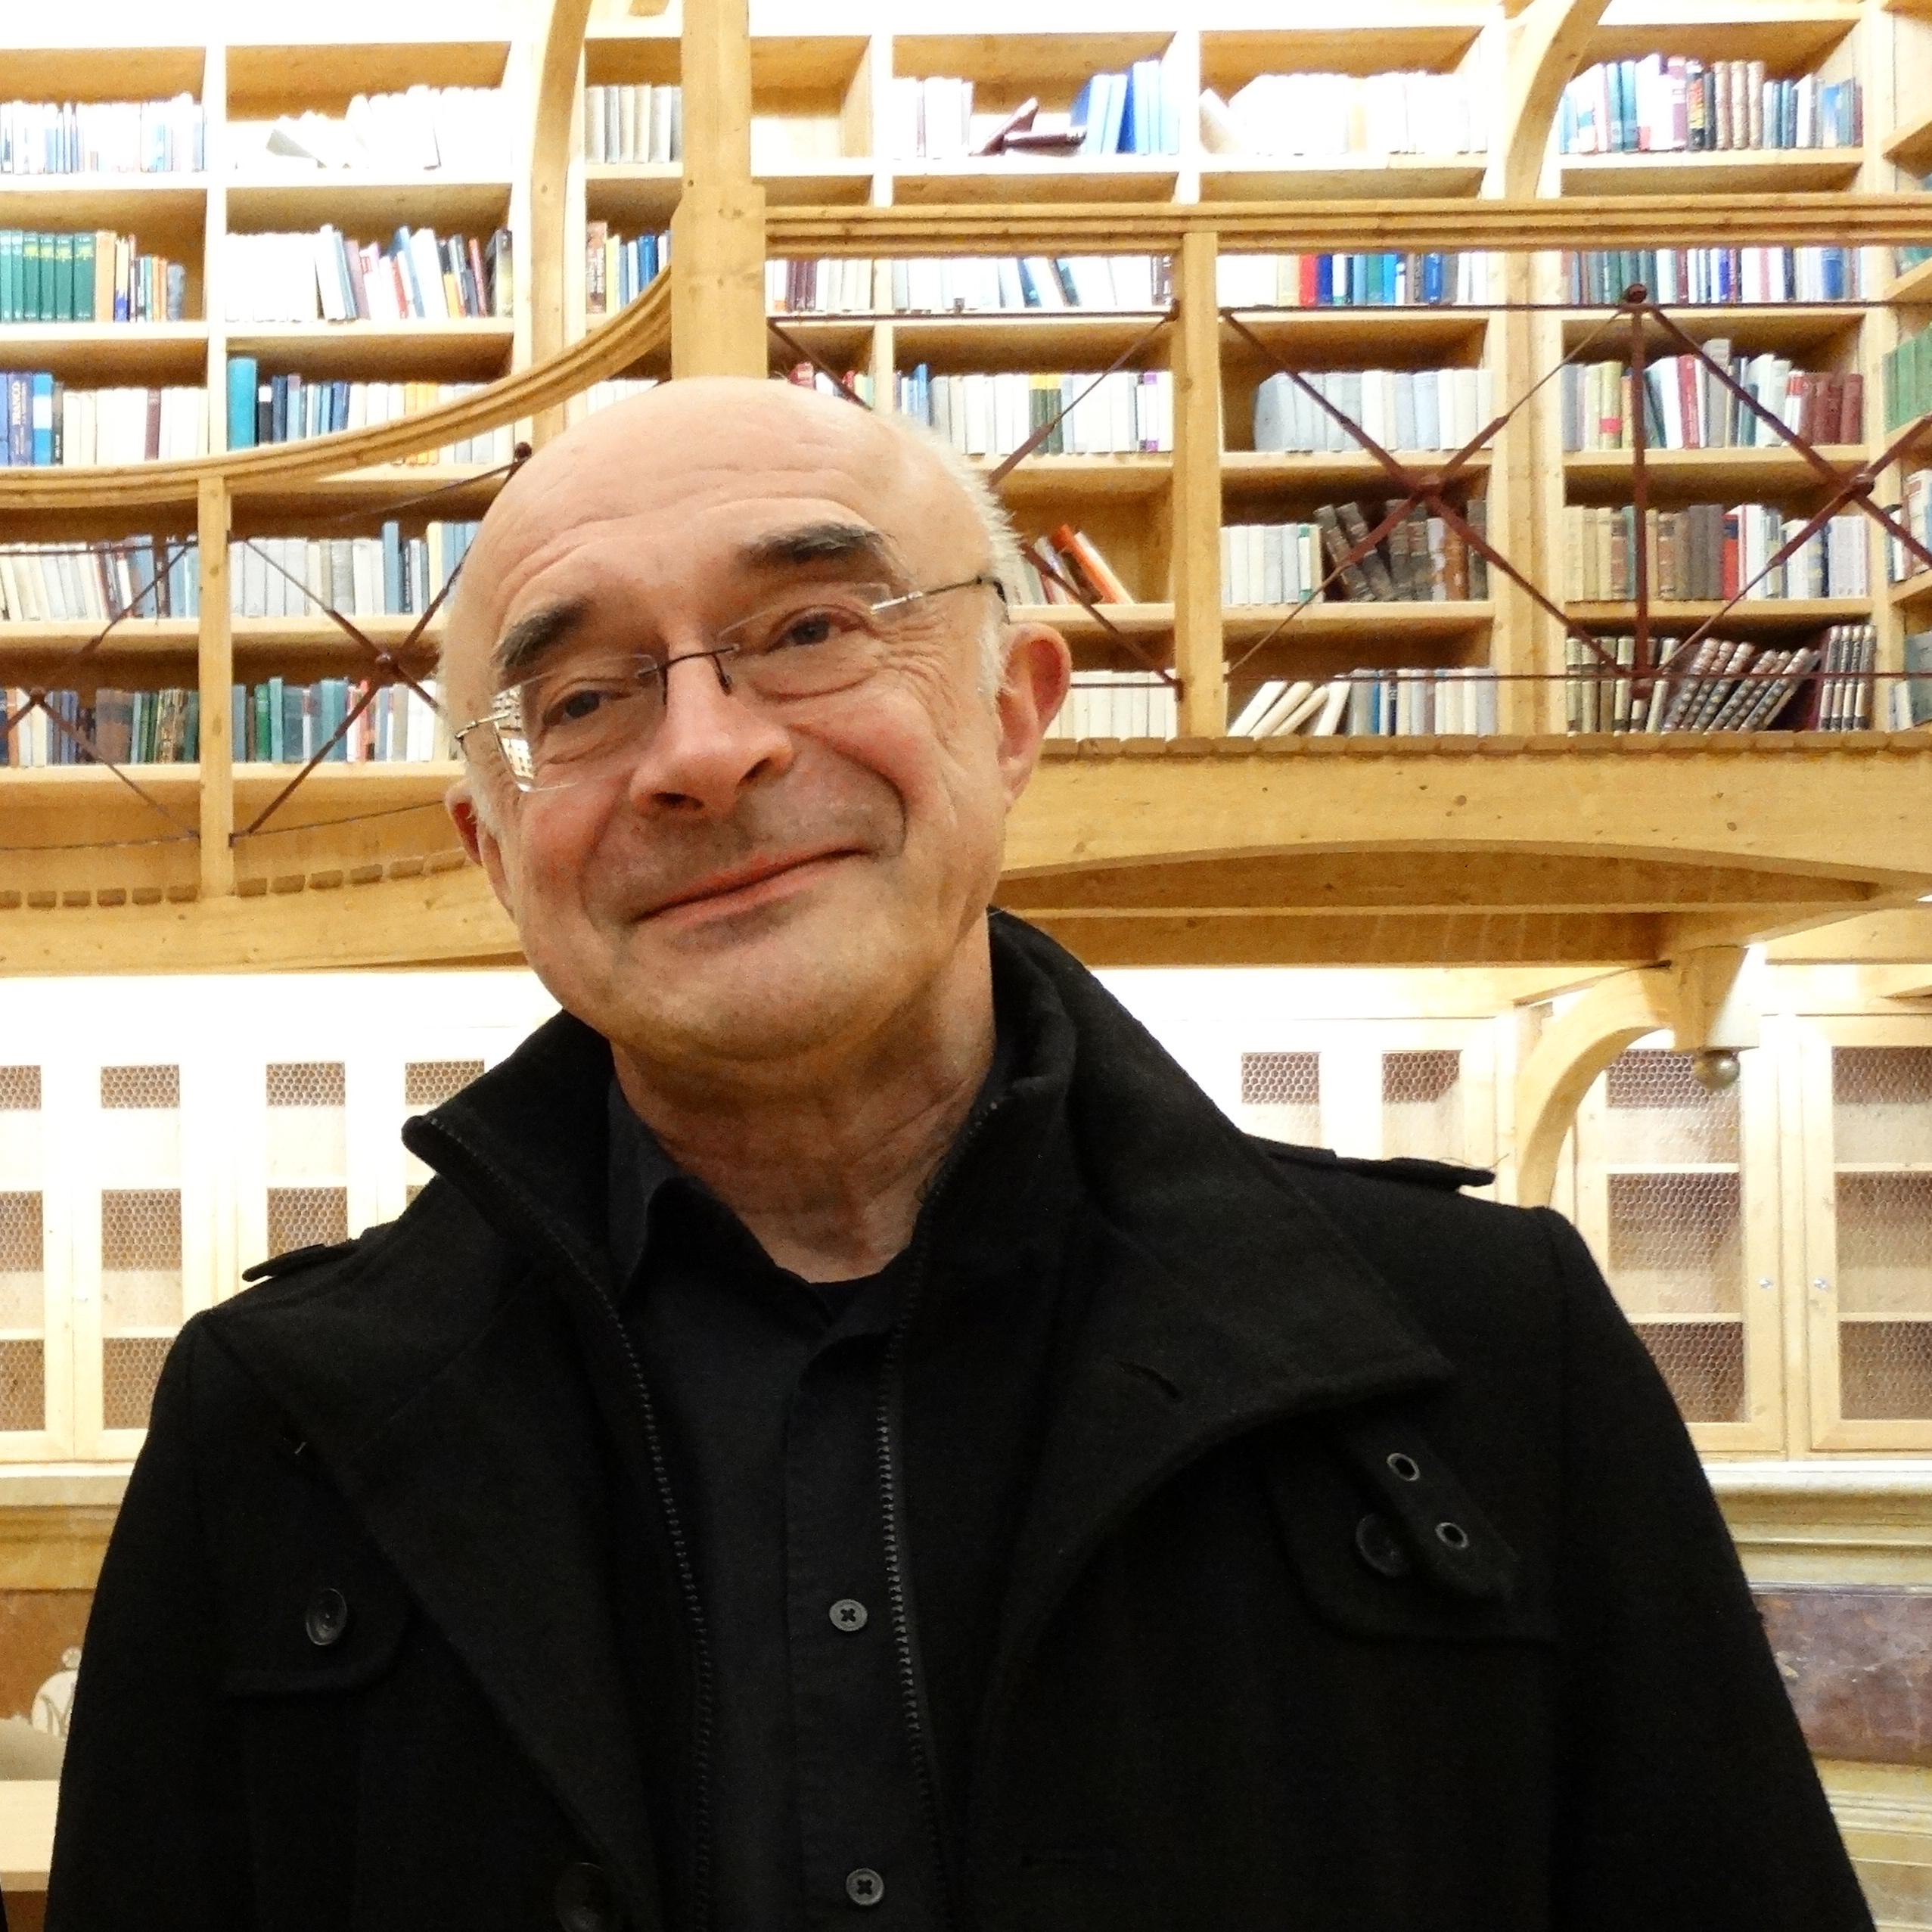 Daniel Saulnier